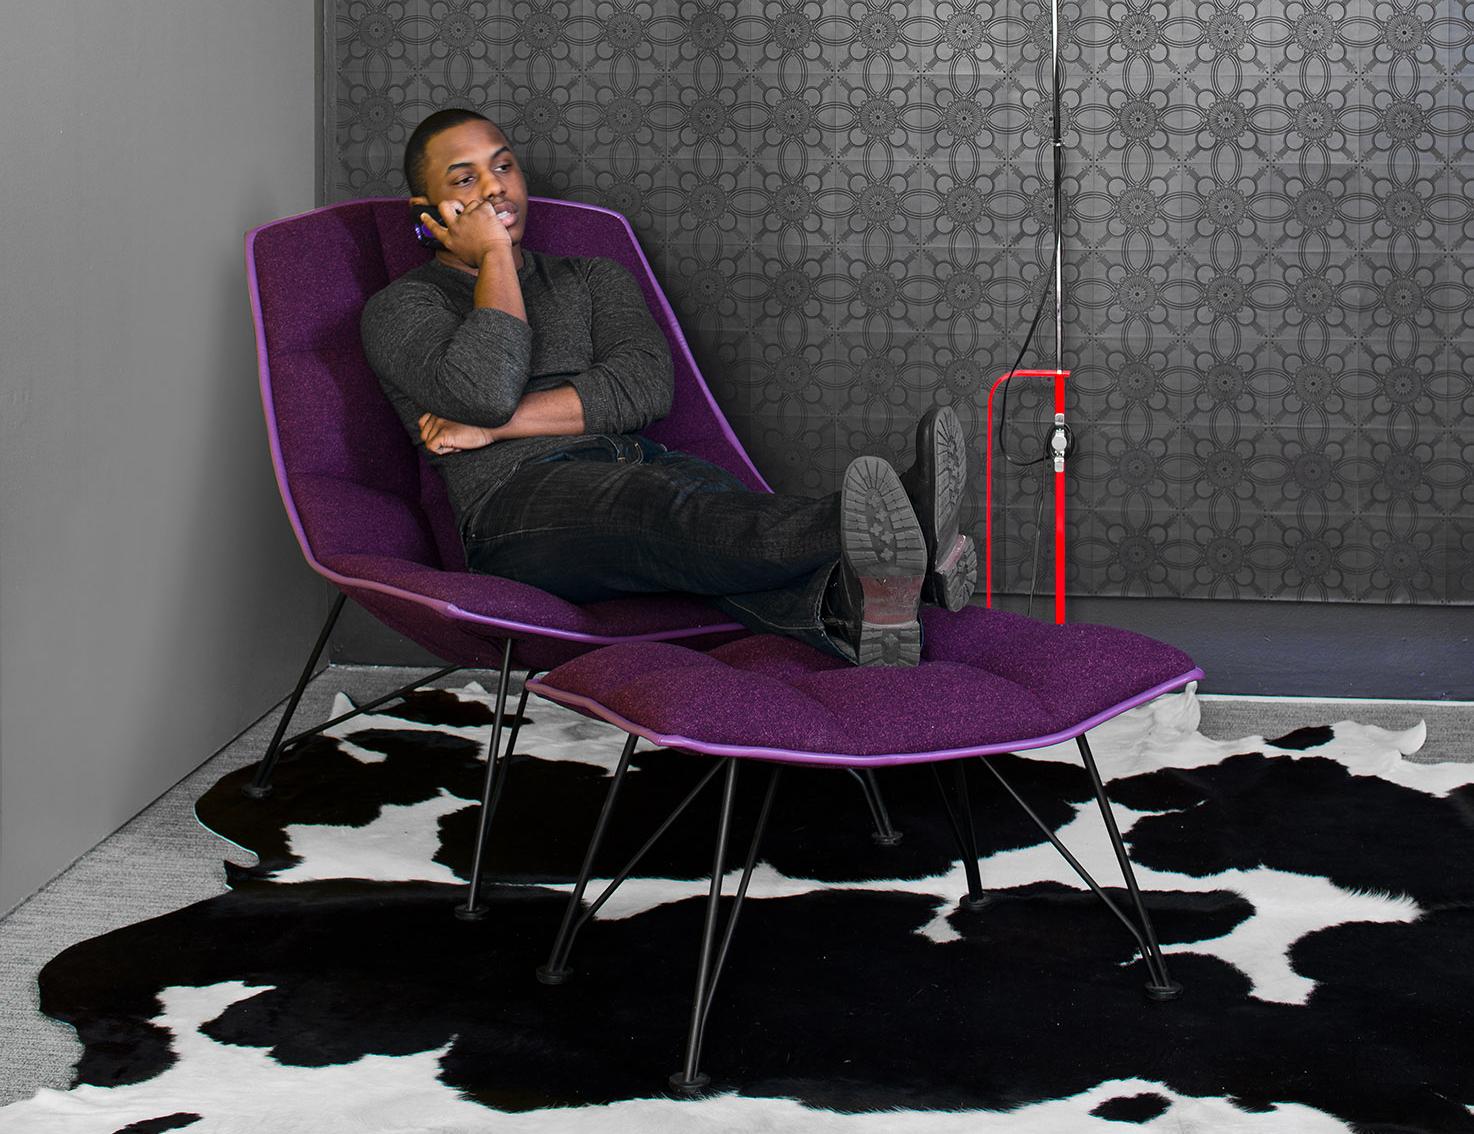 jehs laub lounge chair aeron white 43laub knoll